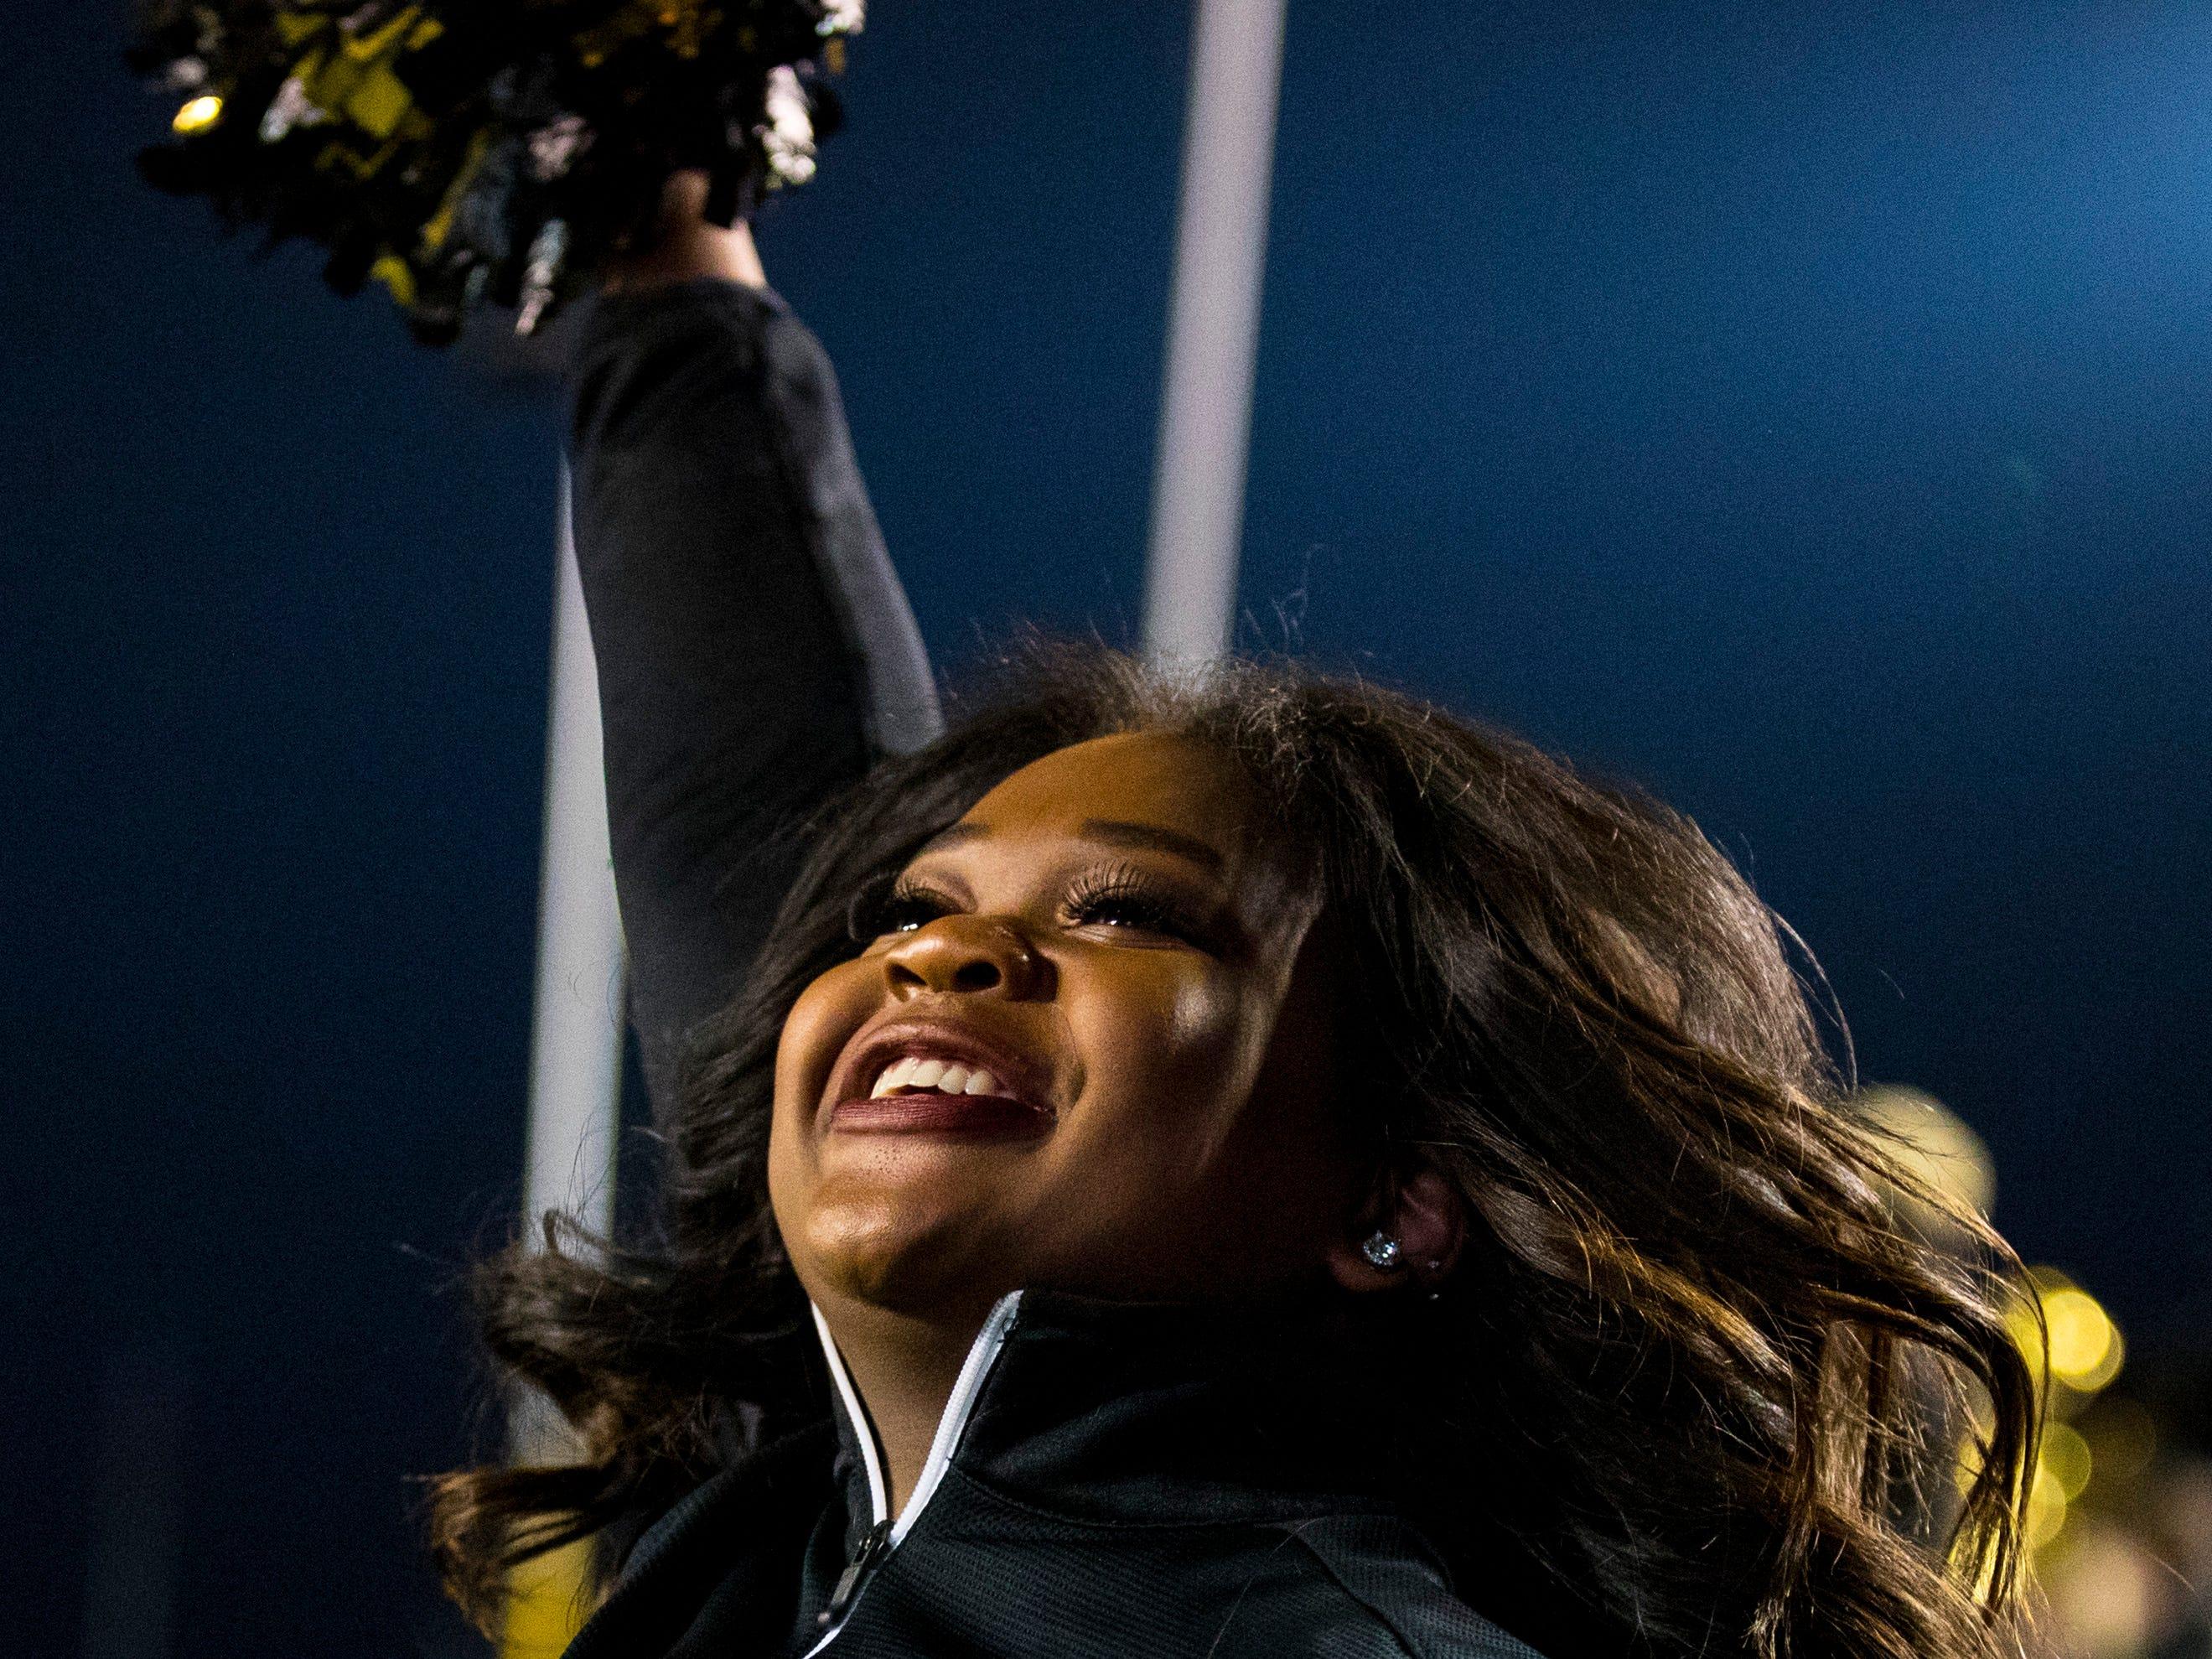 Vanderbilt cheerleader Jordan Williams cheers during Vanderbilt's game against Ole Miss at Vanderbilt Stadium in Nashville on Saturday, Nov. 17, 2018.